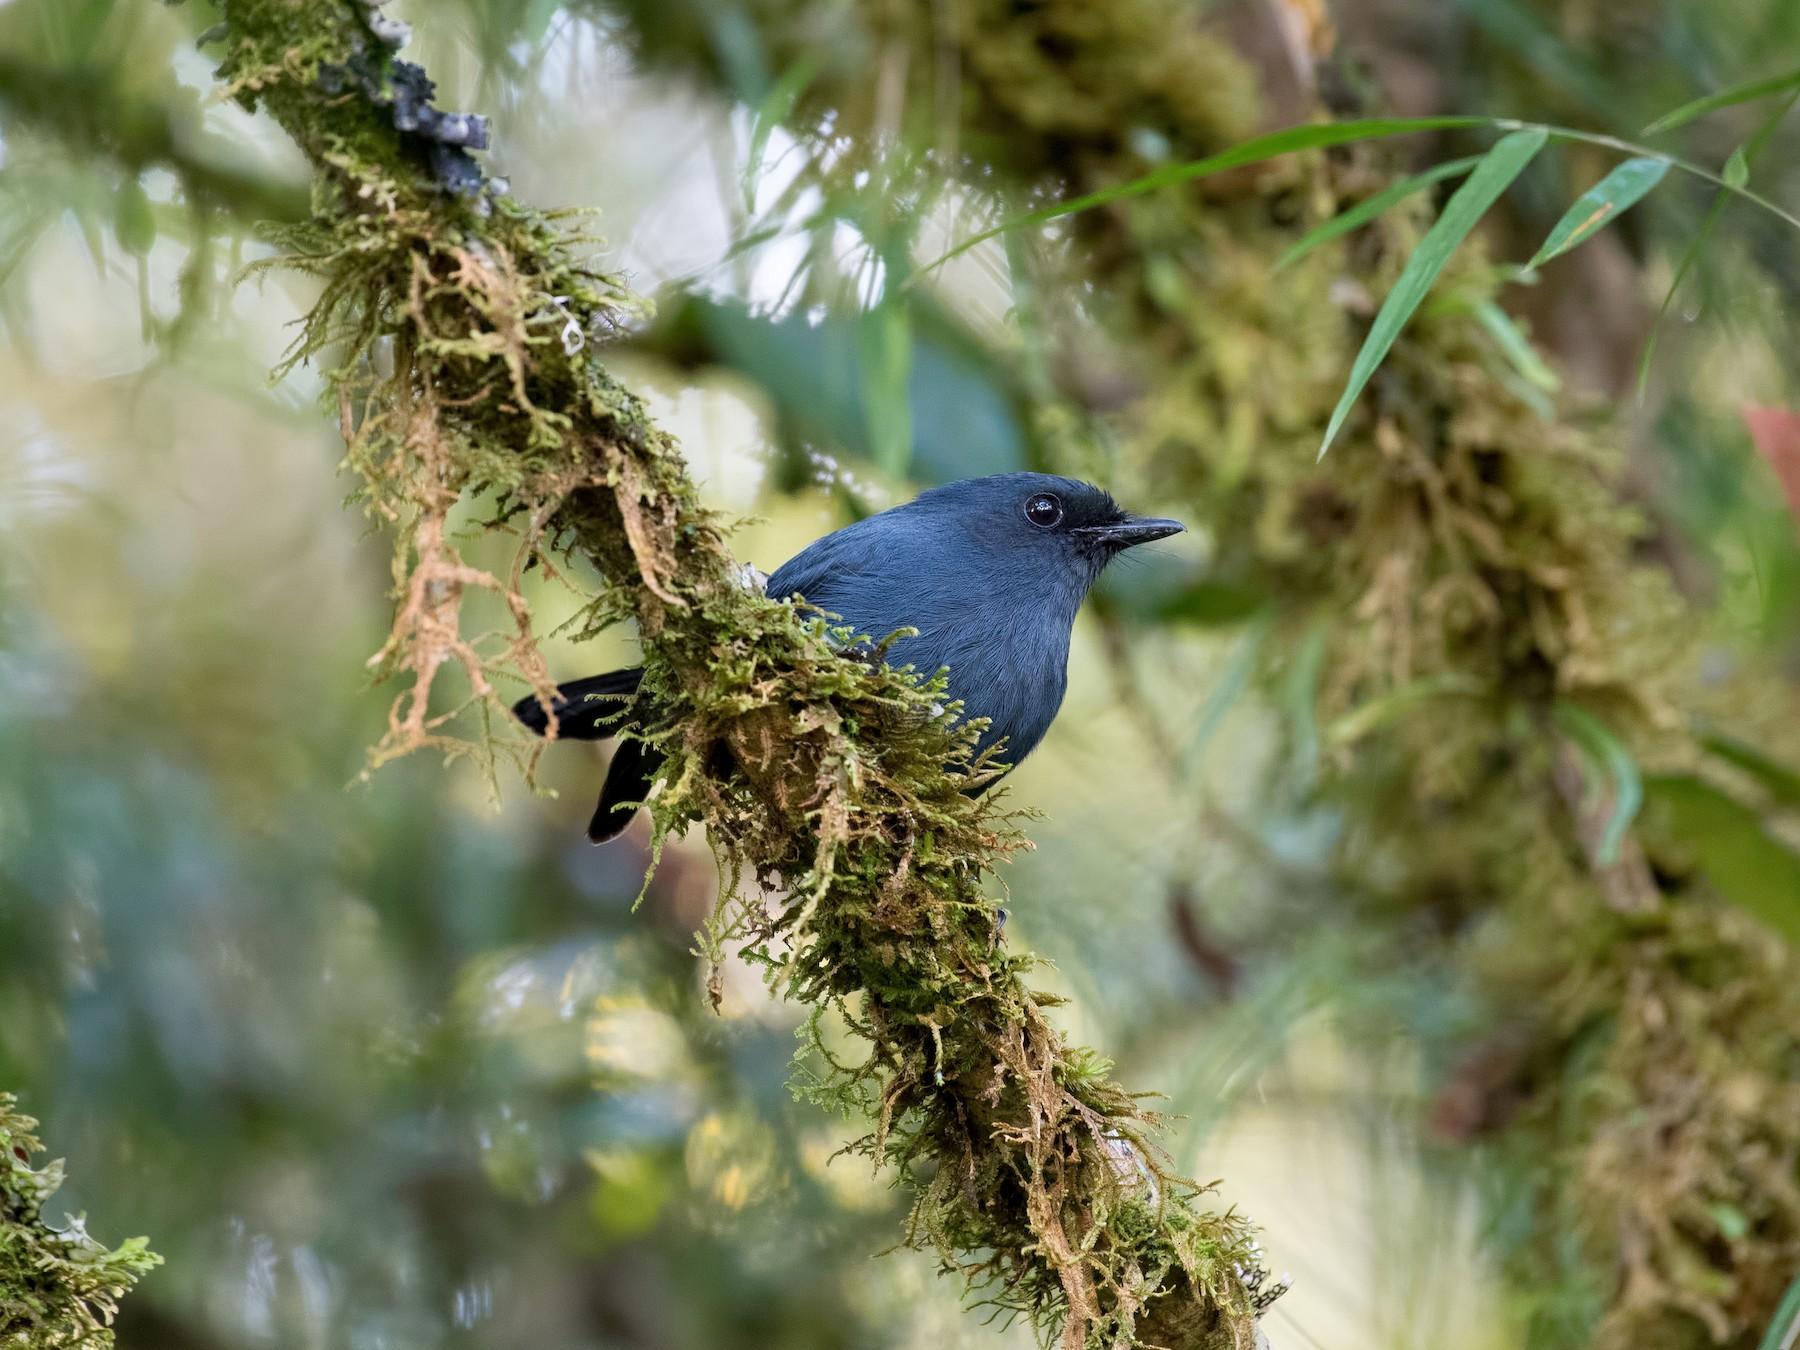 Blue-gray Robin - Shailesh Pinto